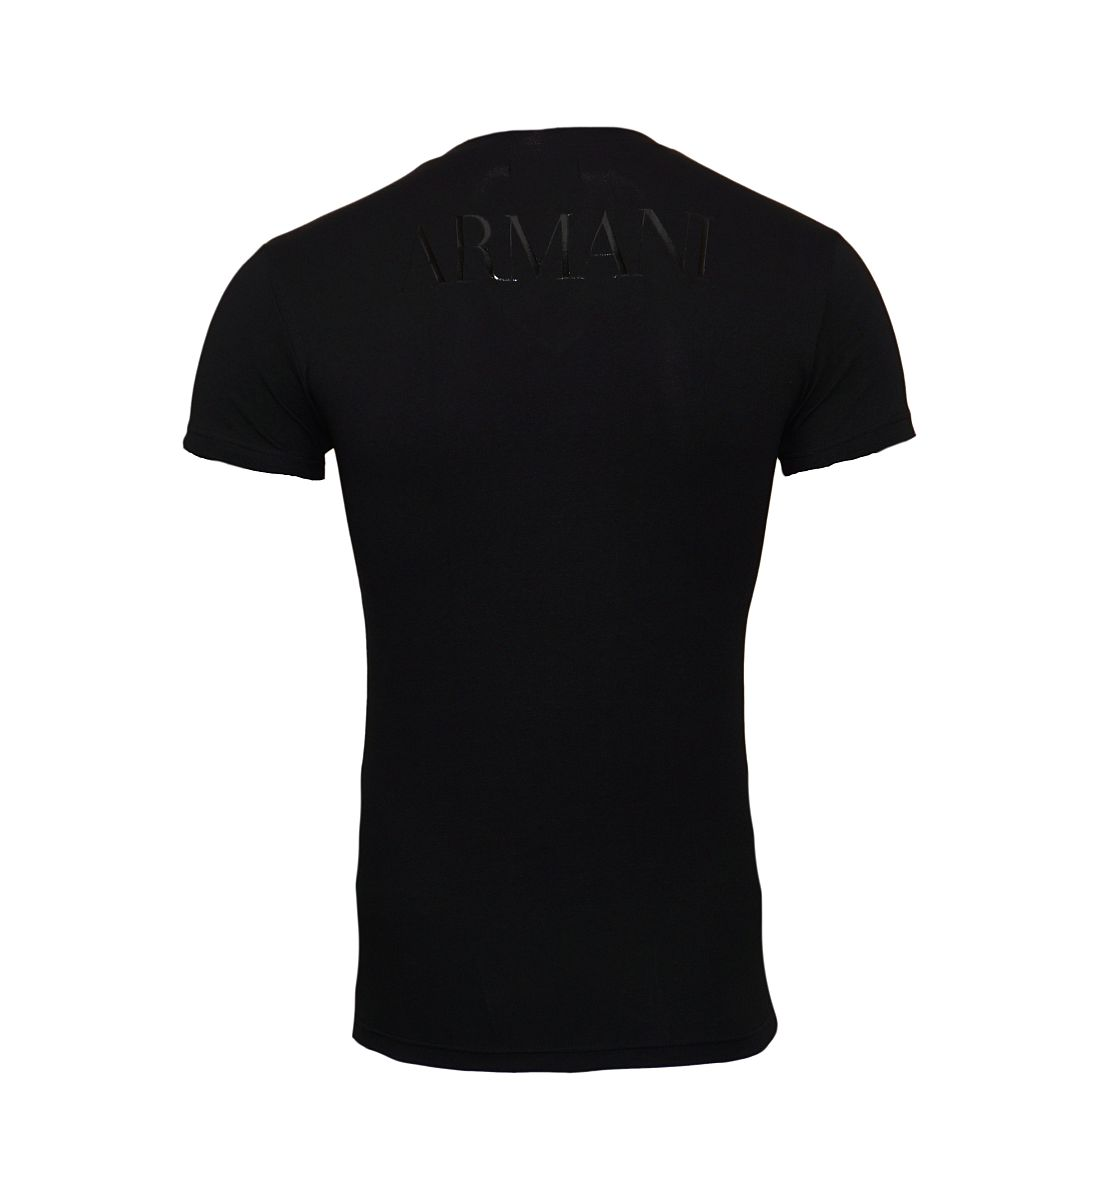 Emporio Armani T-Shirts V-Ausschnitt 110810 8P516 00020 NERO W18-EATS1